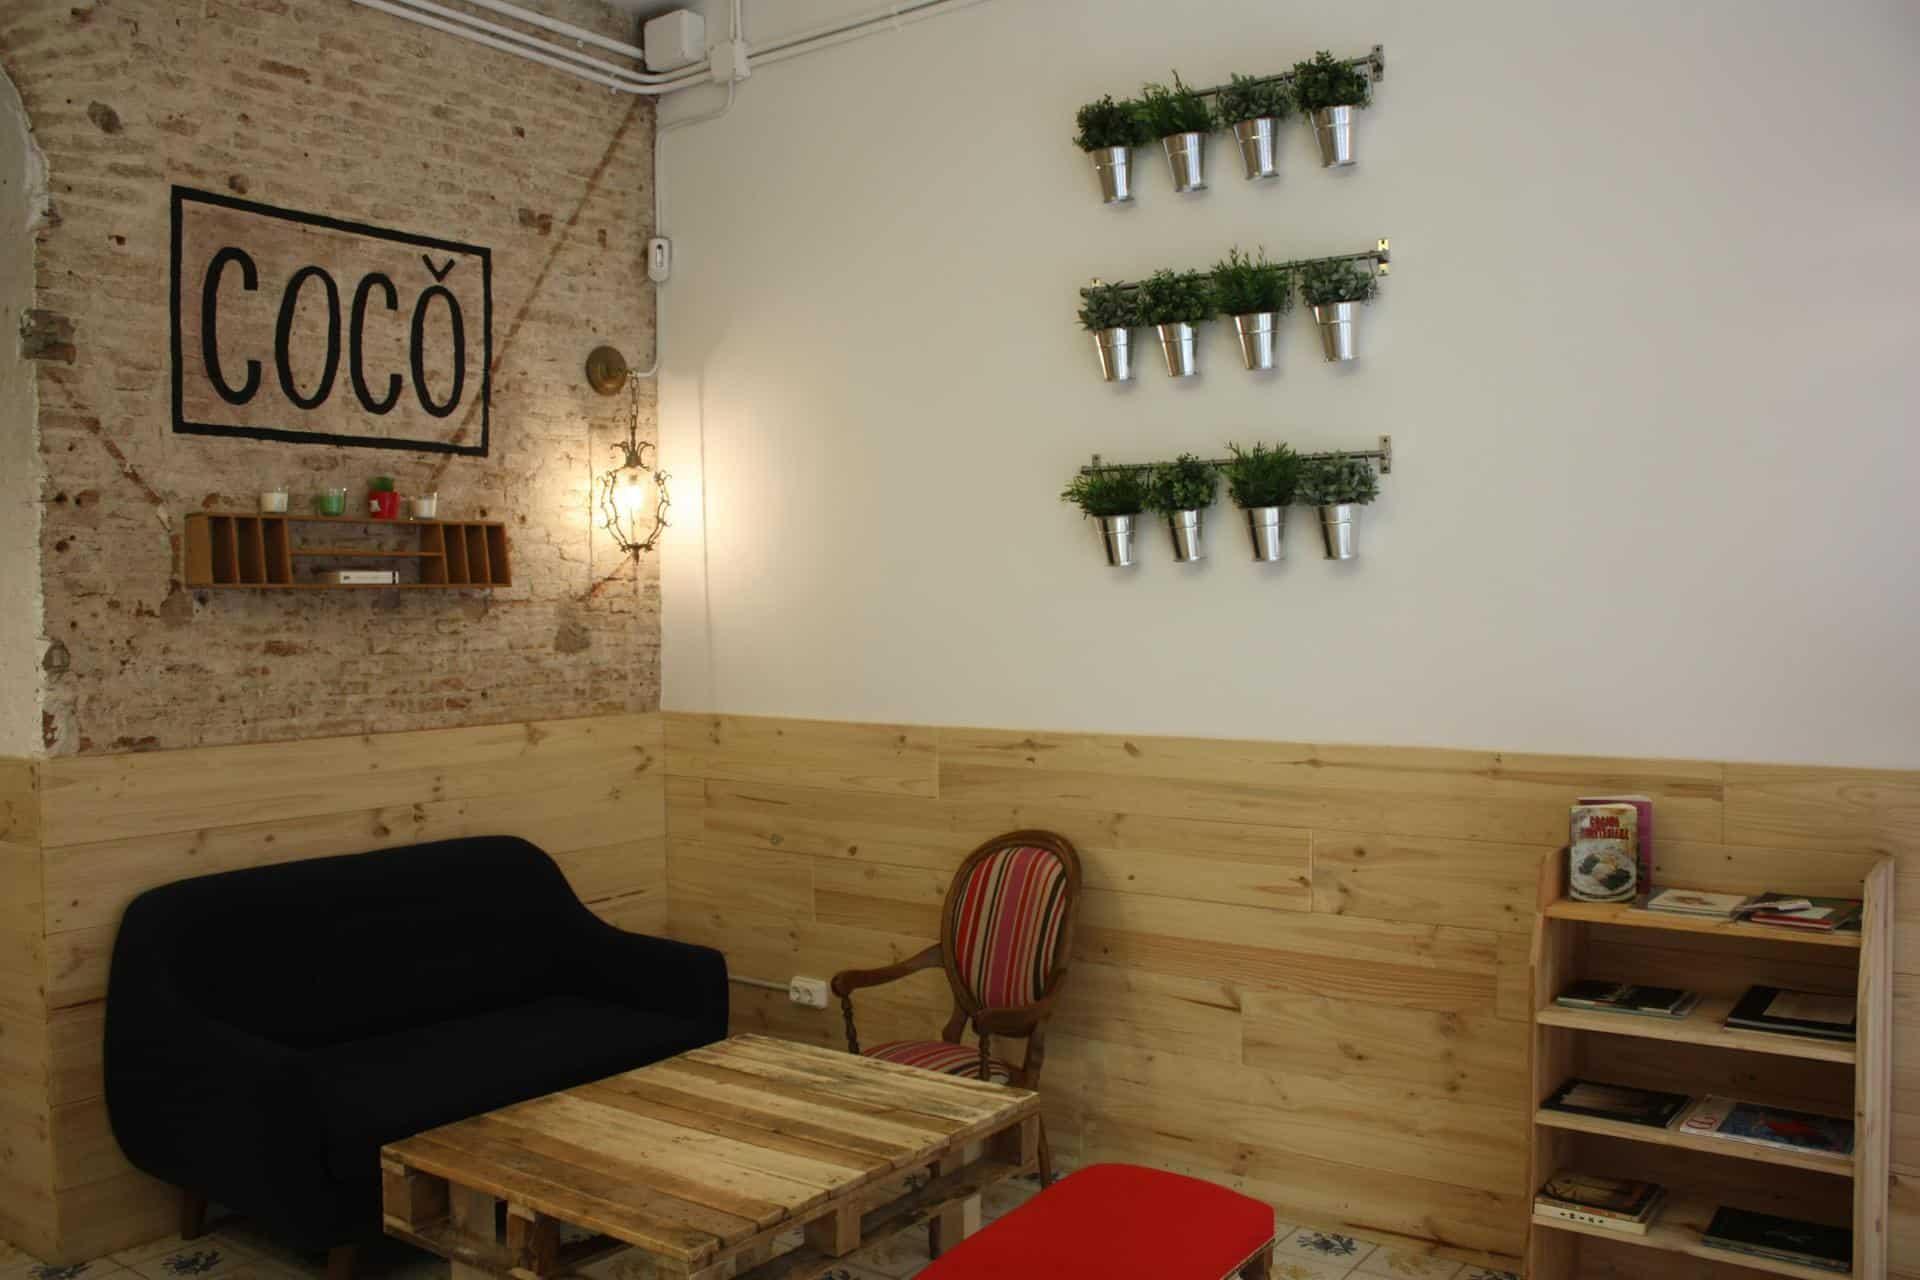 Coco restaurant, Barcelona